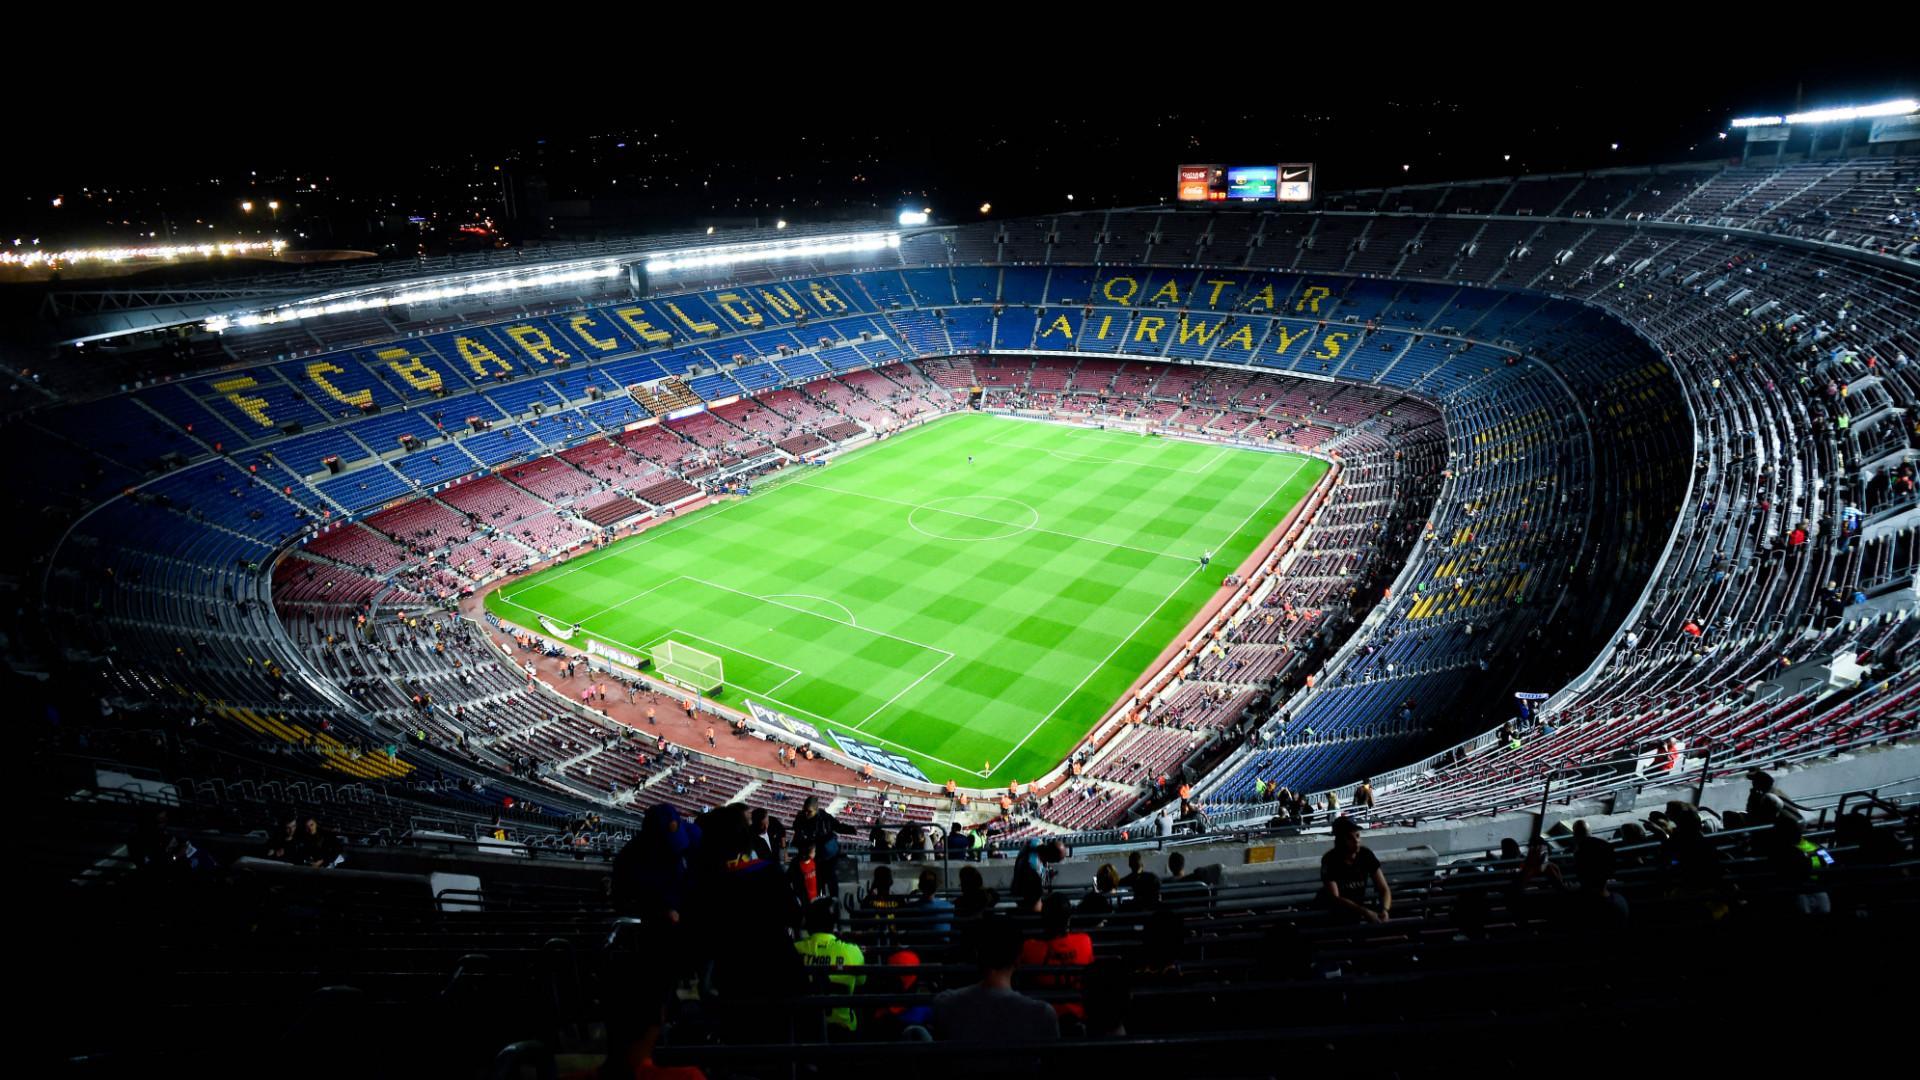 La Liga: Camp Nou Barcelona La Liga 01112014